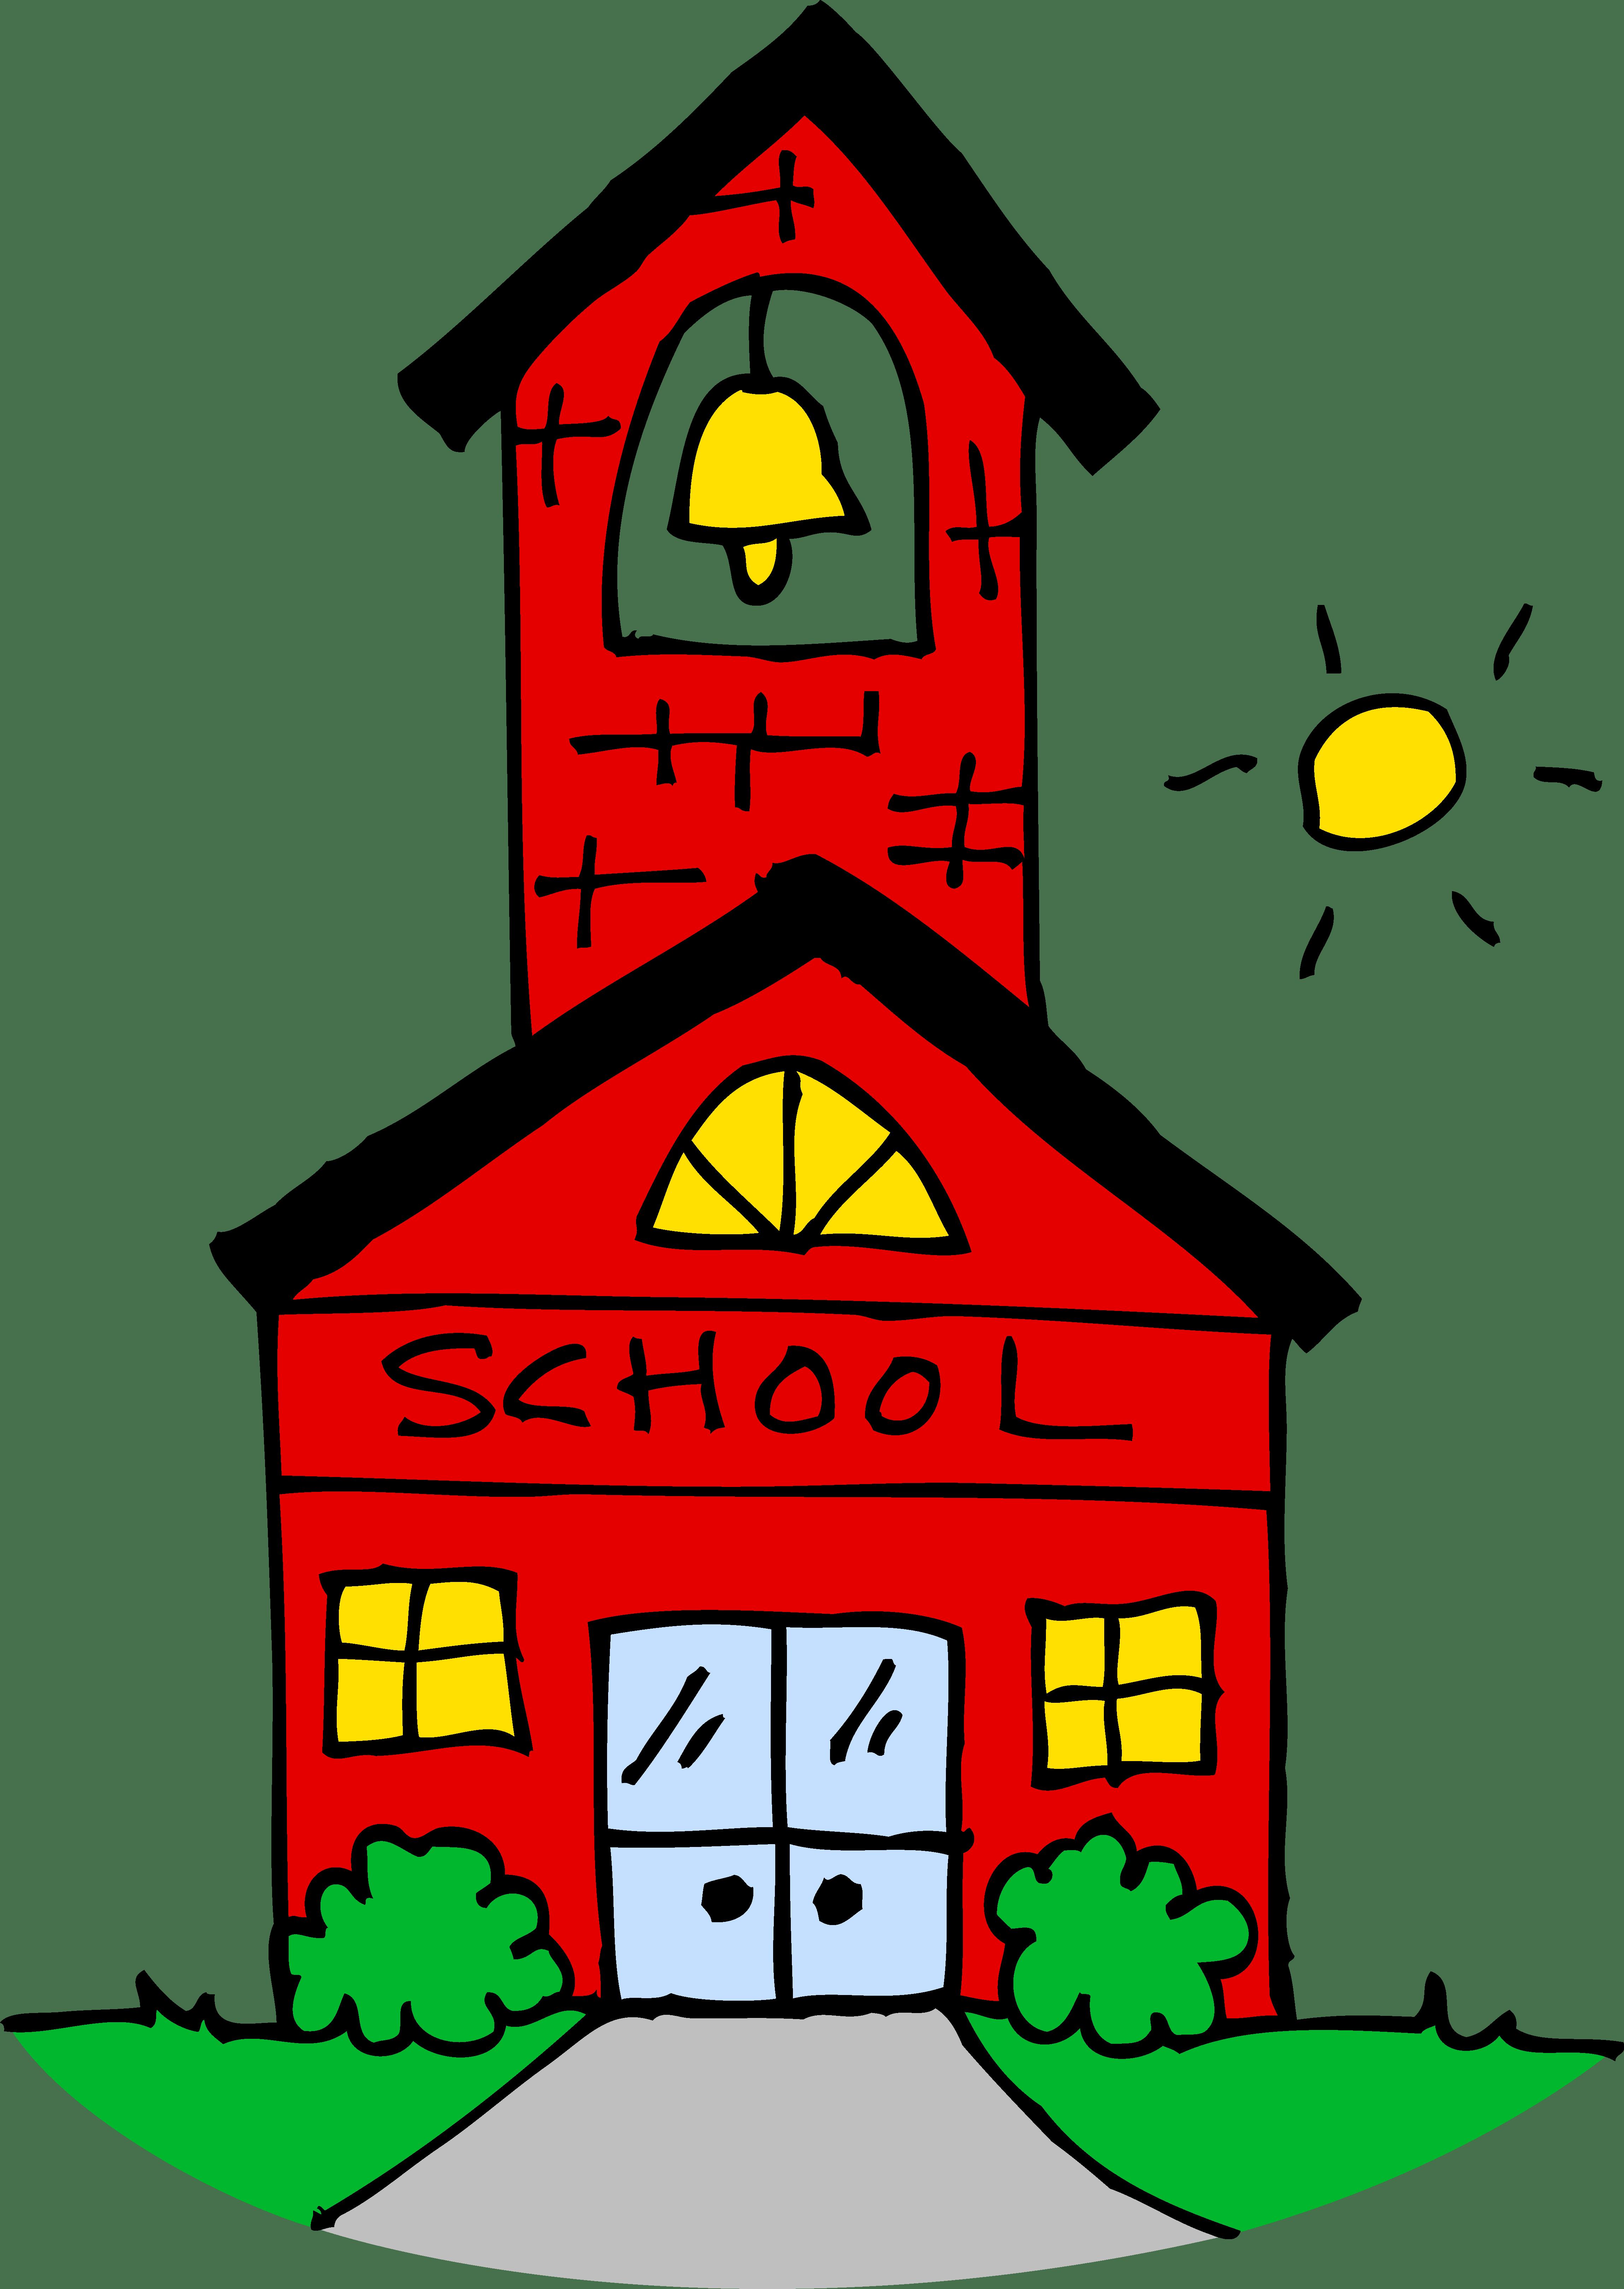 School clipart transparent background 1 » Clipart Portal.